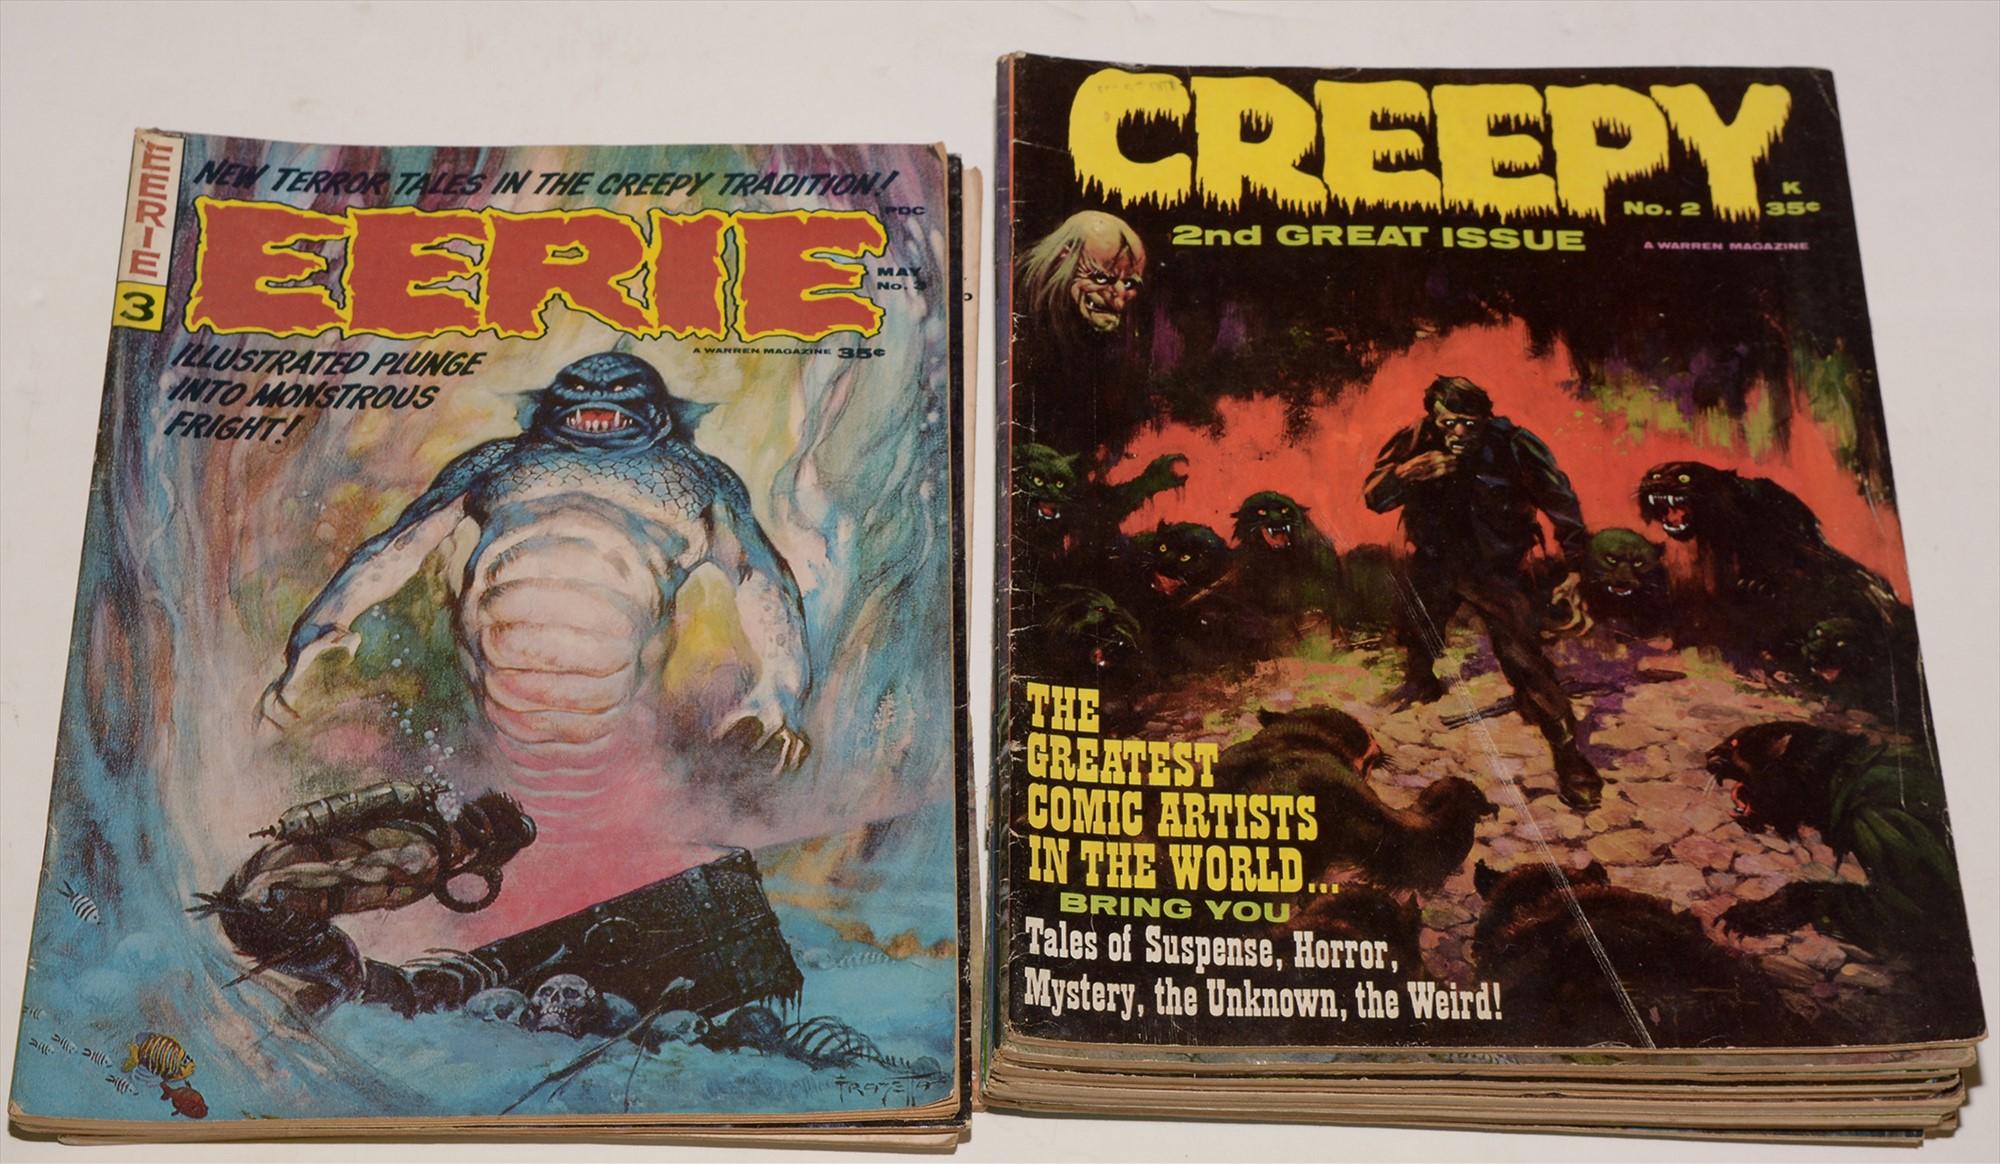 Eerie and Creepy comics.